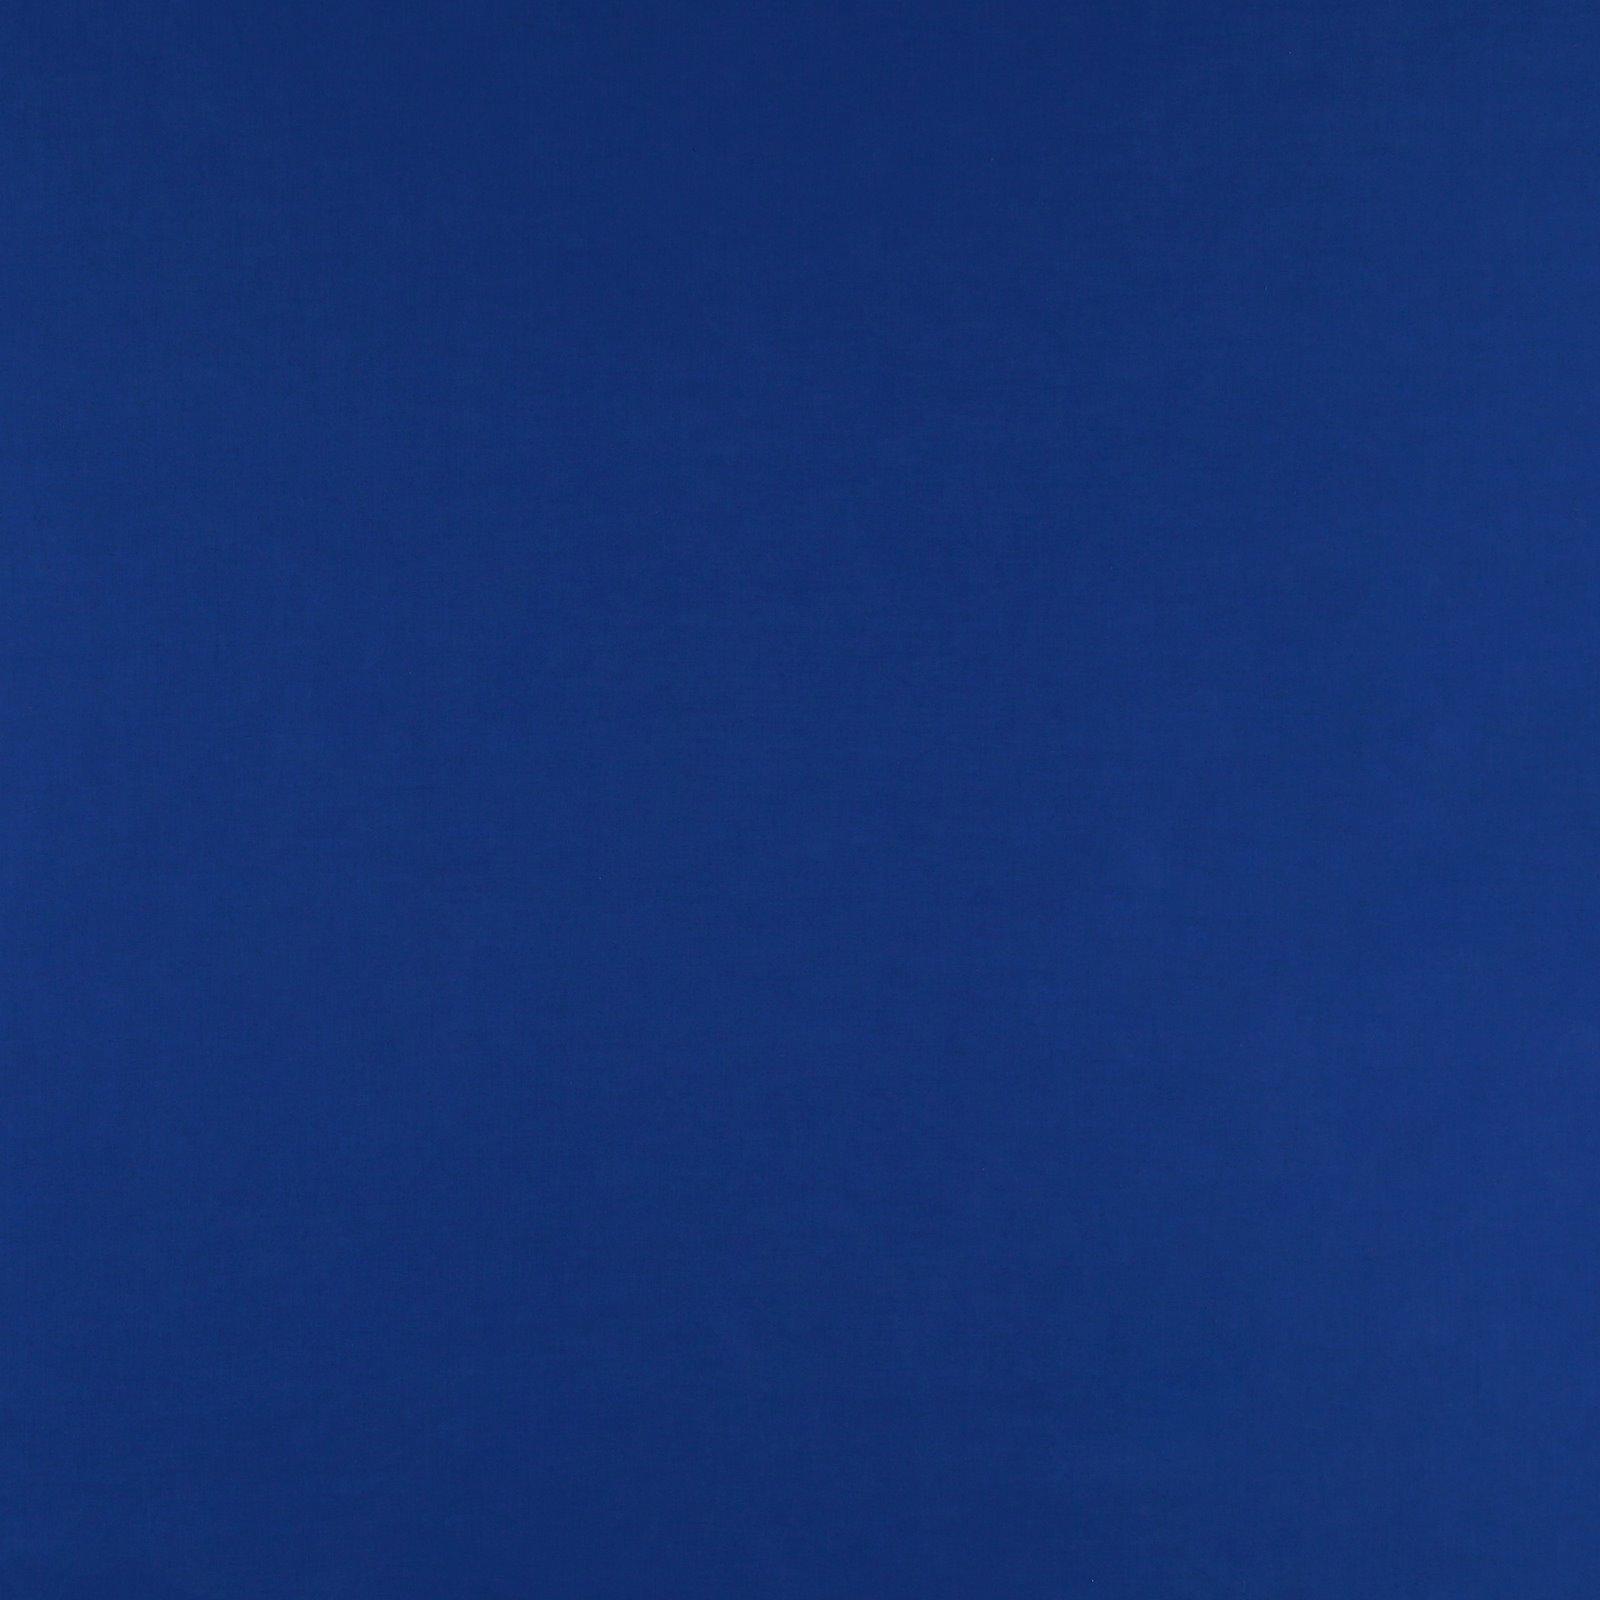 Light woven cotton cobalt 842295_pack_solid